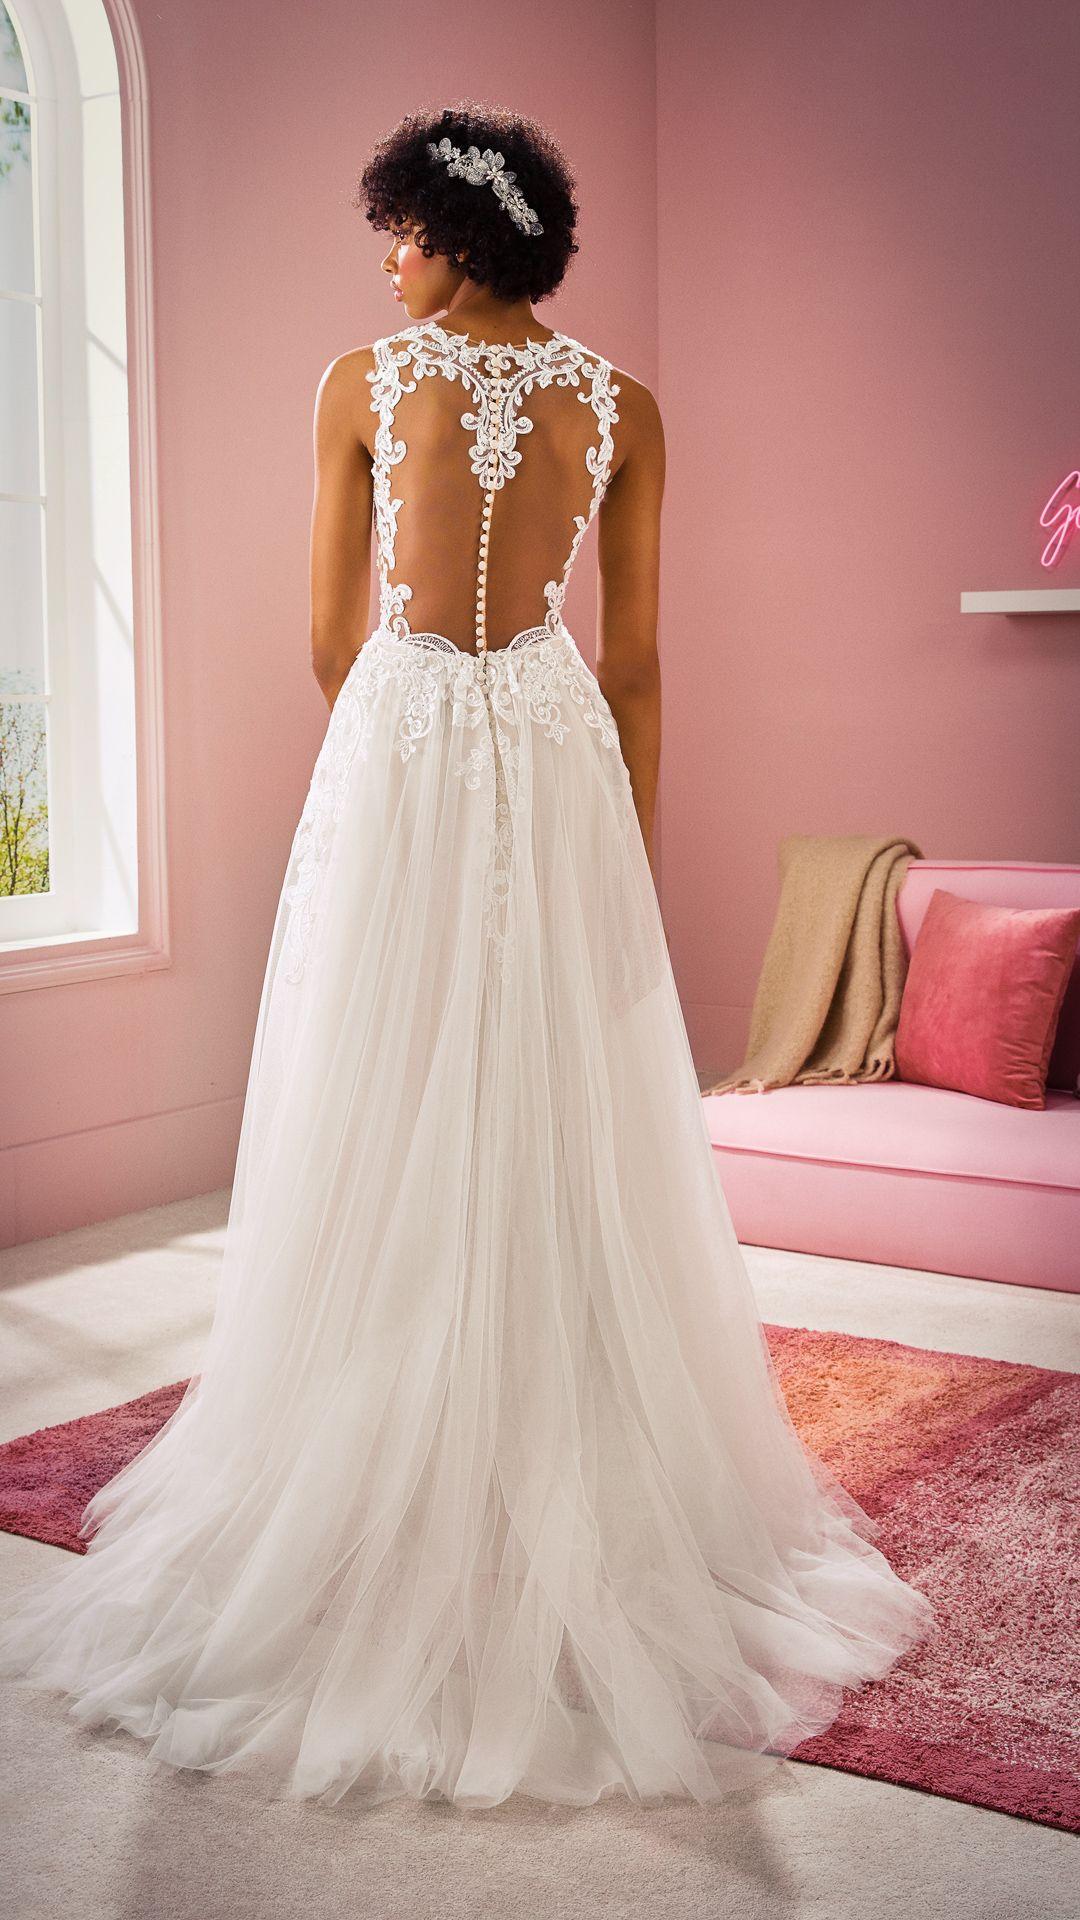 Hochzeitskleider 10 White One Kollektion Modell: NAIJA-C